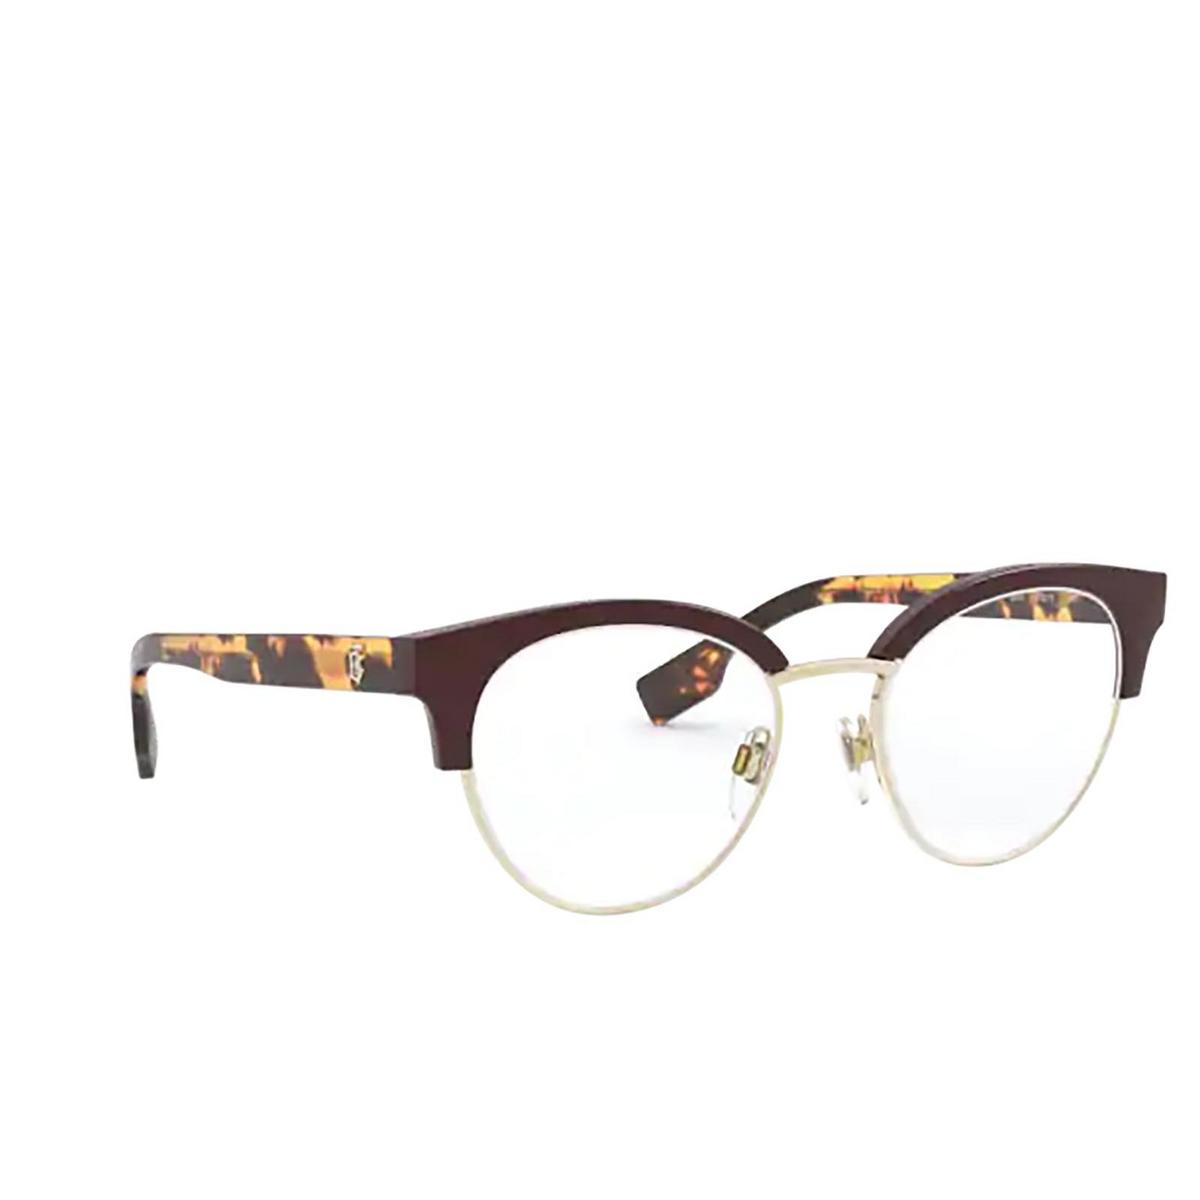 Burberry® Round Eyeglasses: Birch BE2316 color Bordeaux / Pale Gold 3869 - three-quarters view.